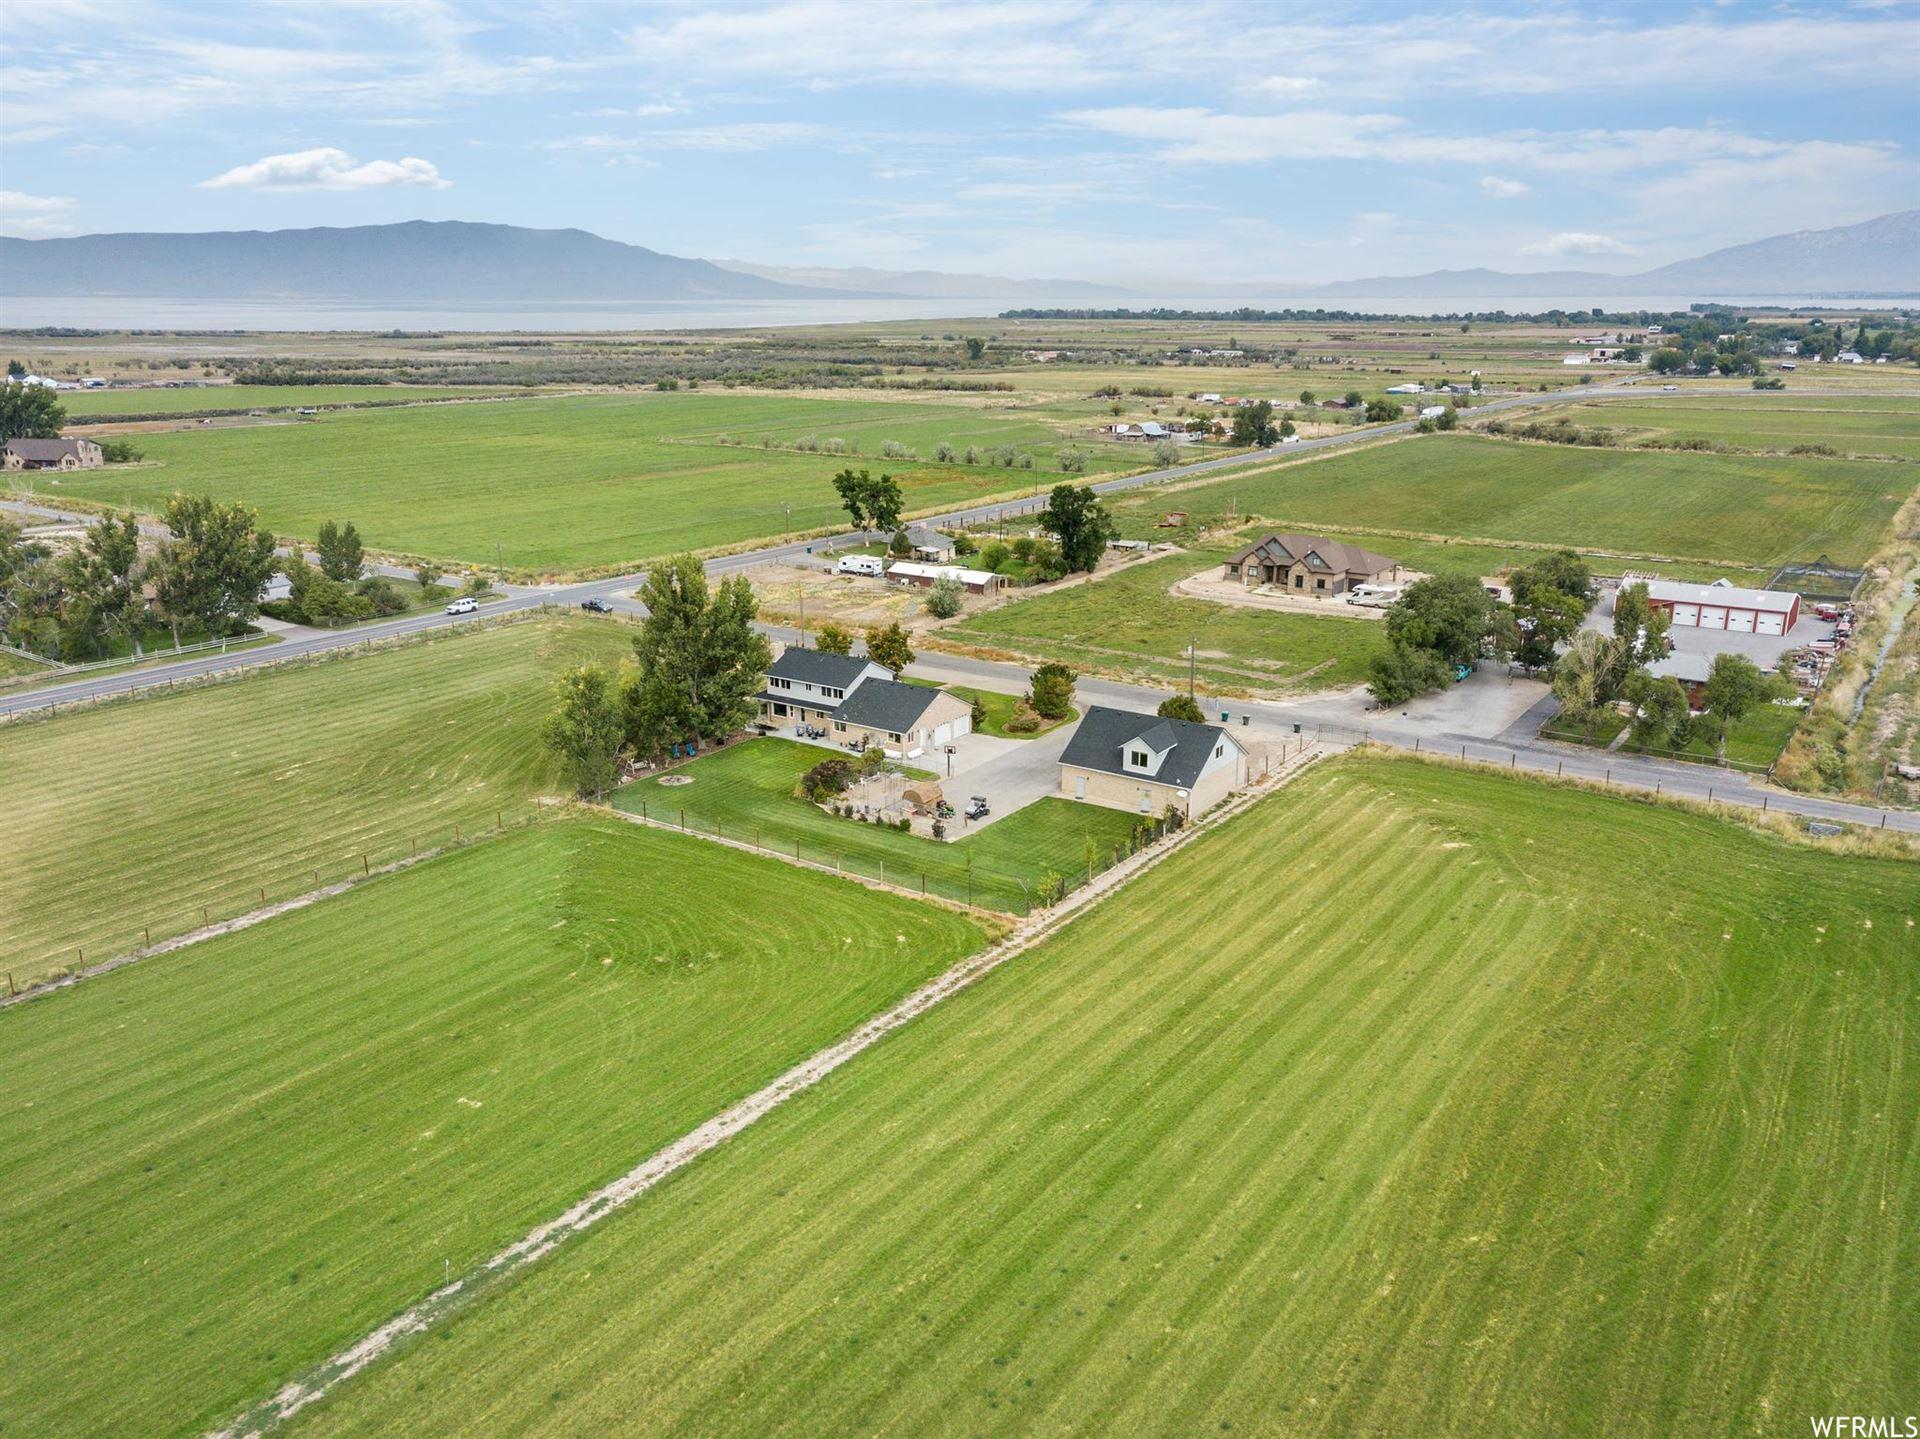 Photo of 3151 W 4800 S, Spanish Fork, UT 84660 (MLS # 1768556)